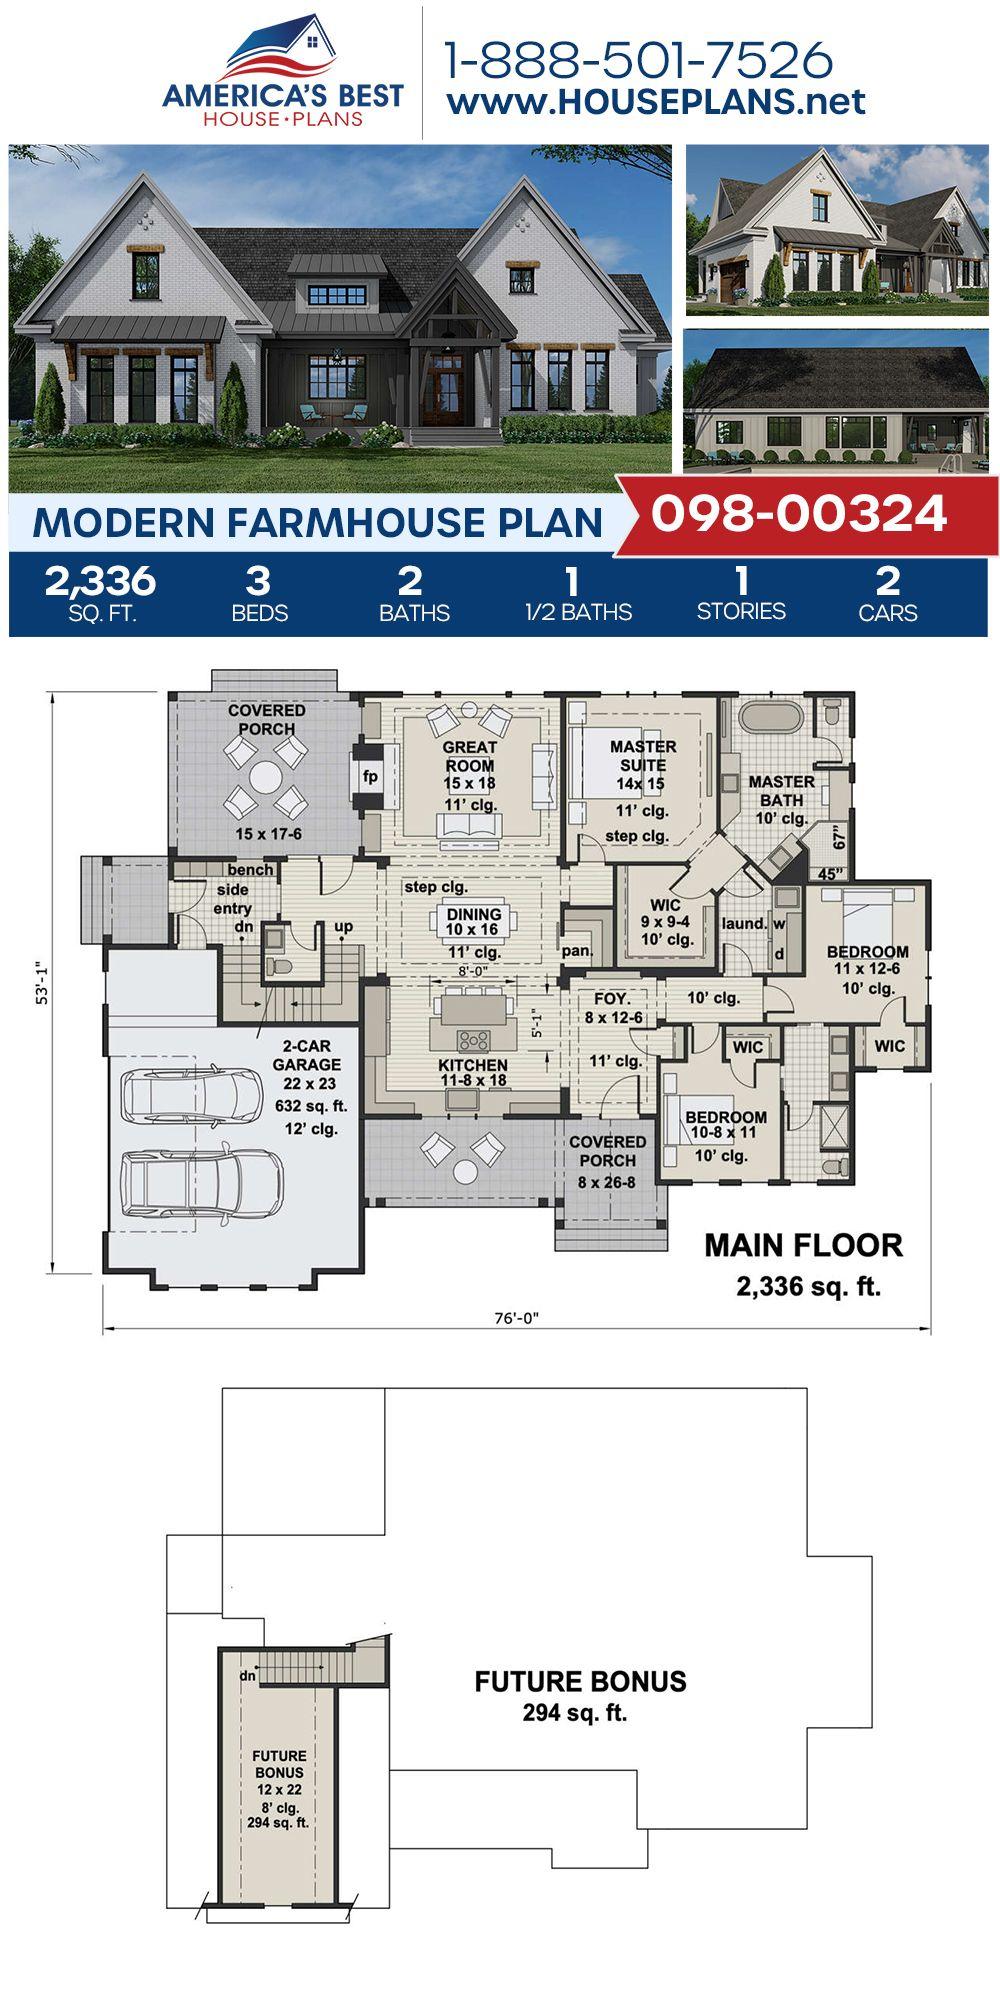 House Plan 098 00324 Modern Farmhouse Plan 2 336 Square Feet 3 Bedrooms 2 5 Bathrooms Modern Farmhouse Plans Farmhouse Plans Beautiful House Plans